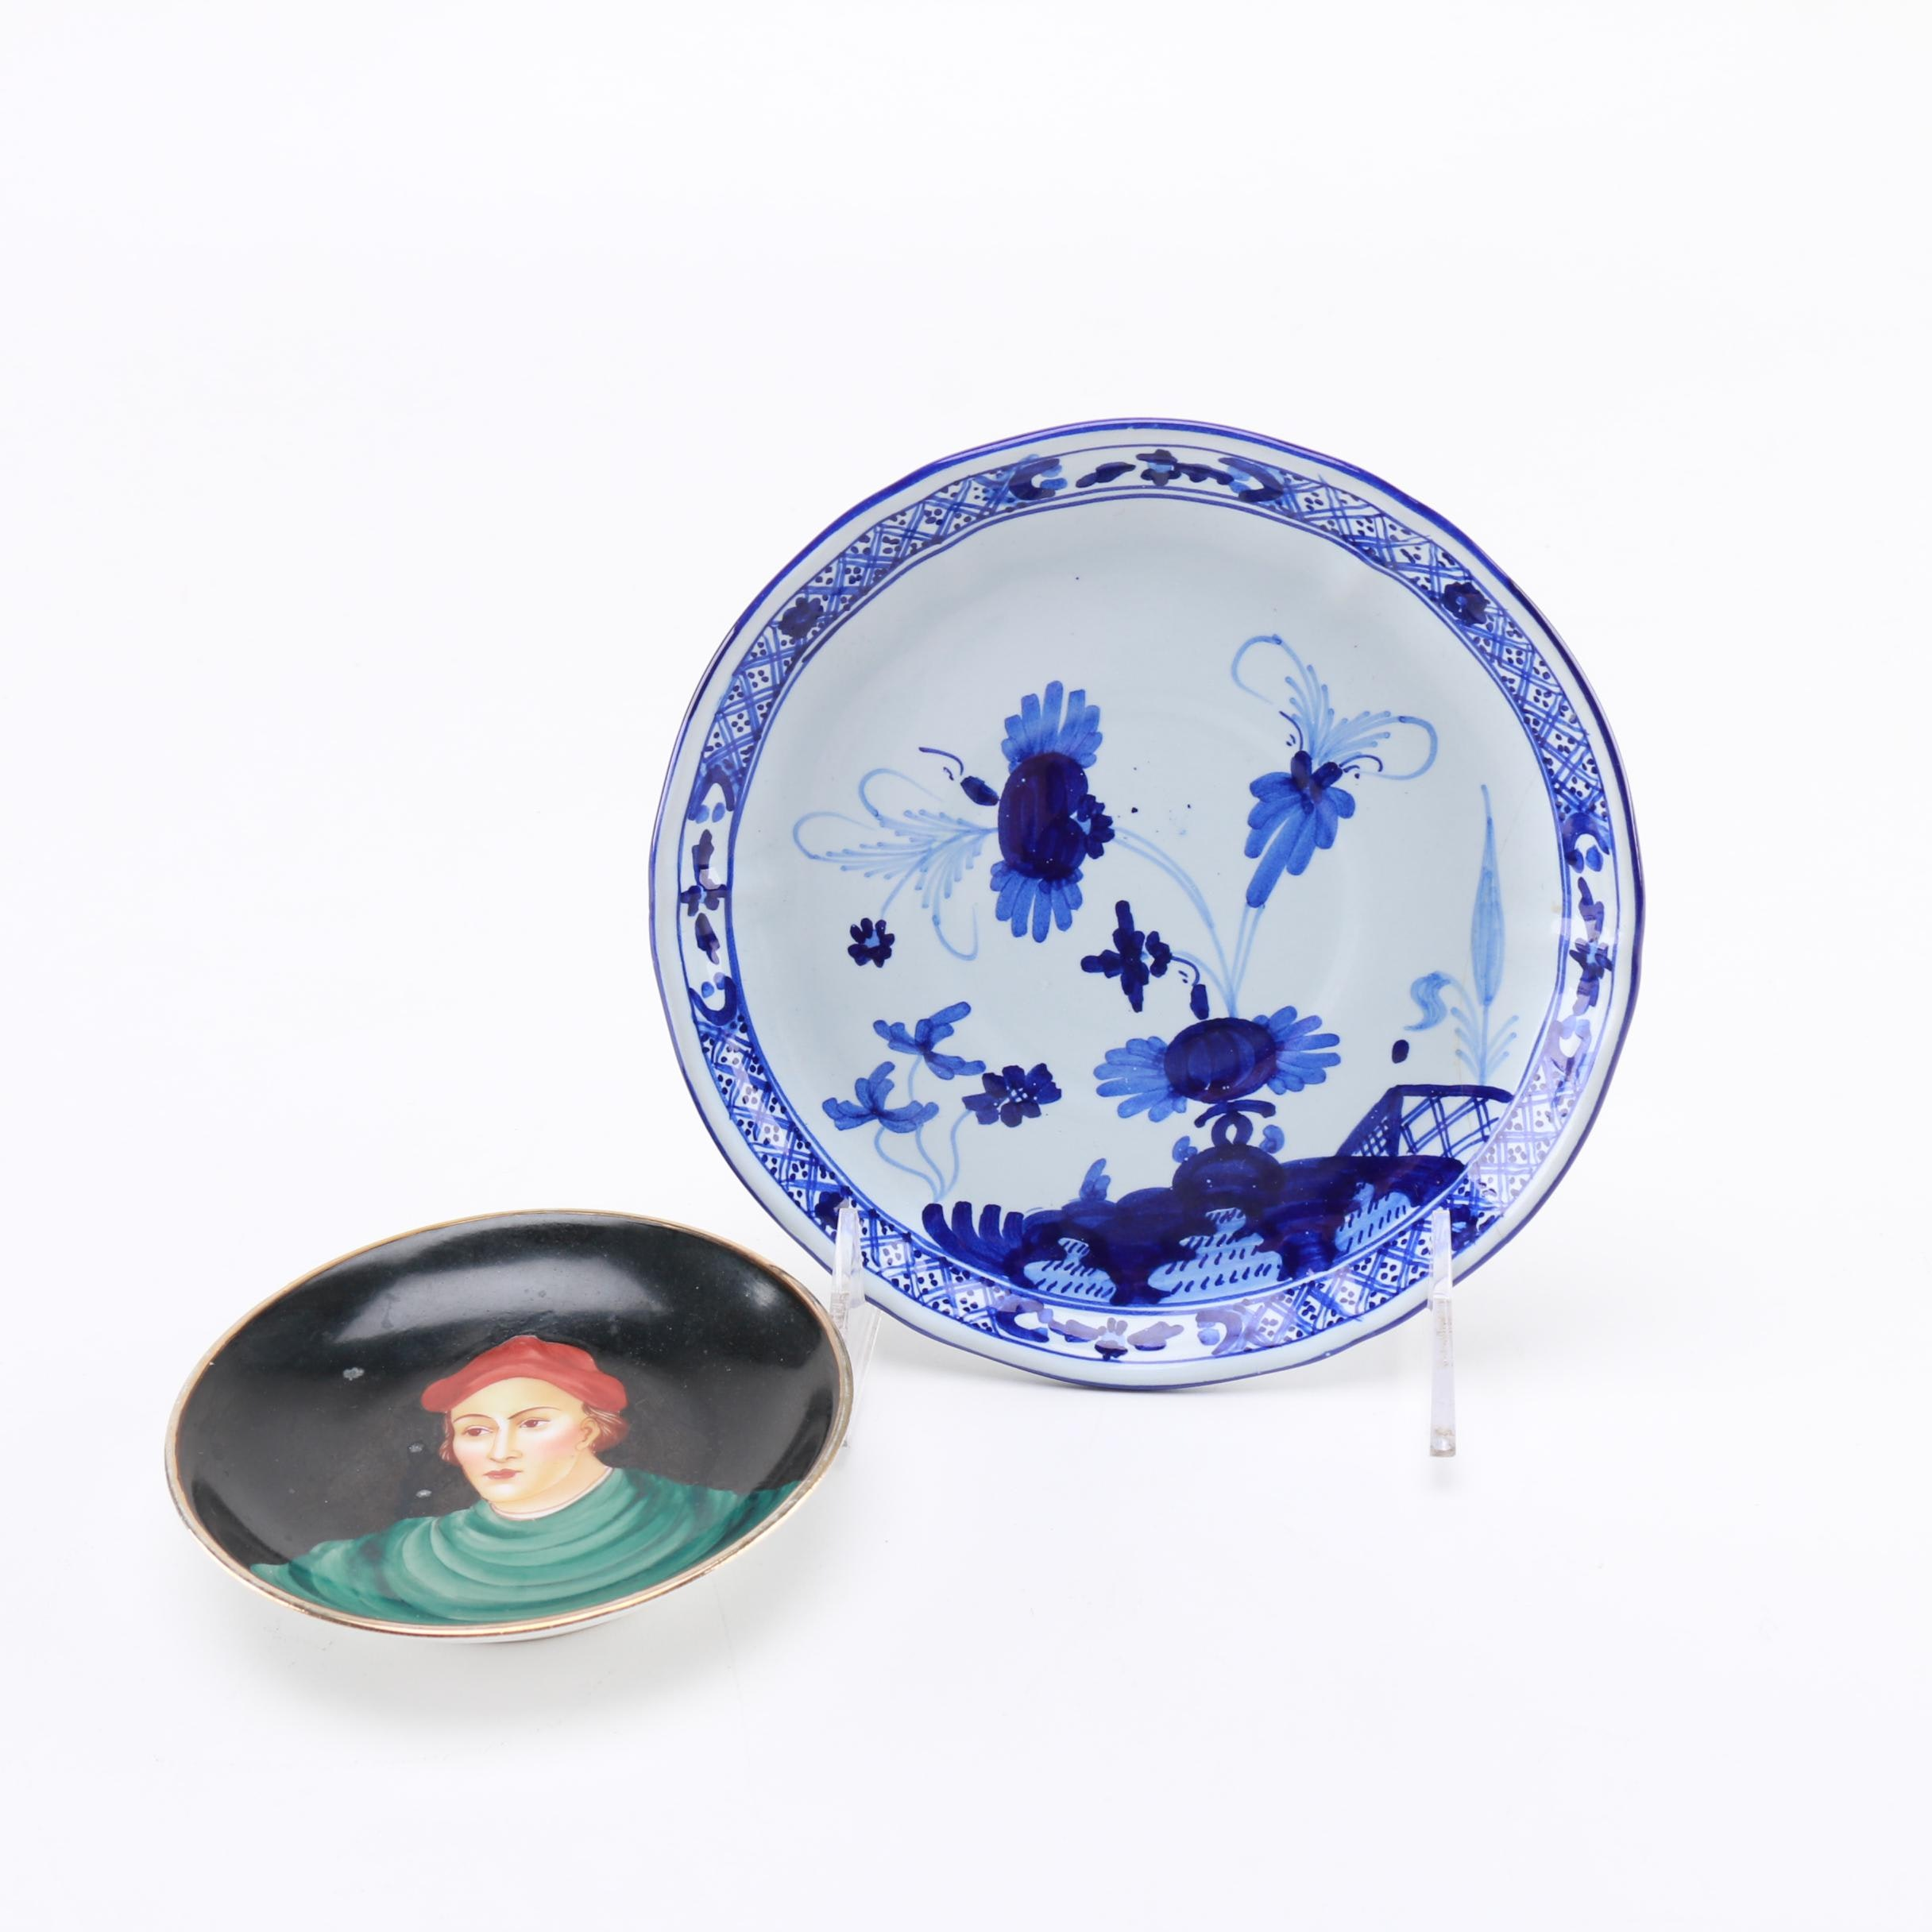 Hand Painted Italian China Plates